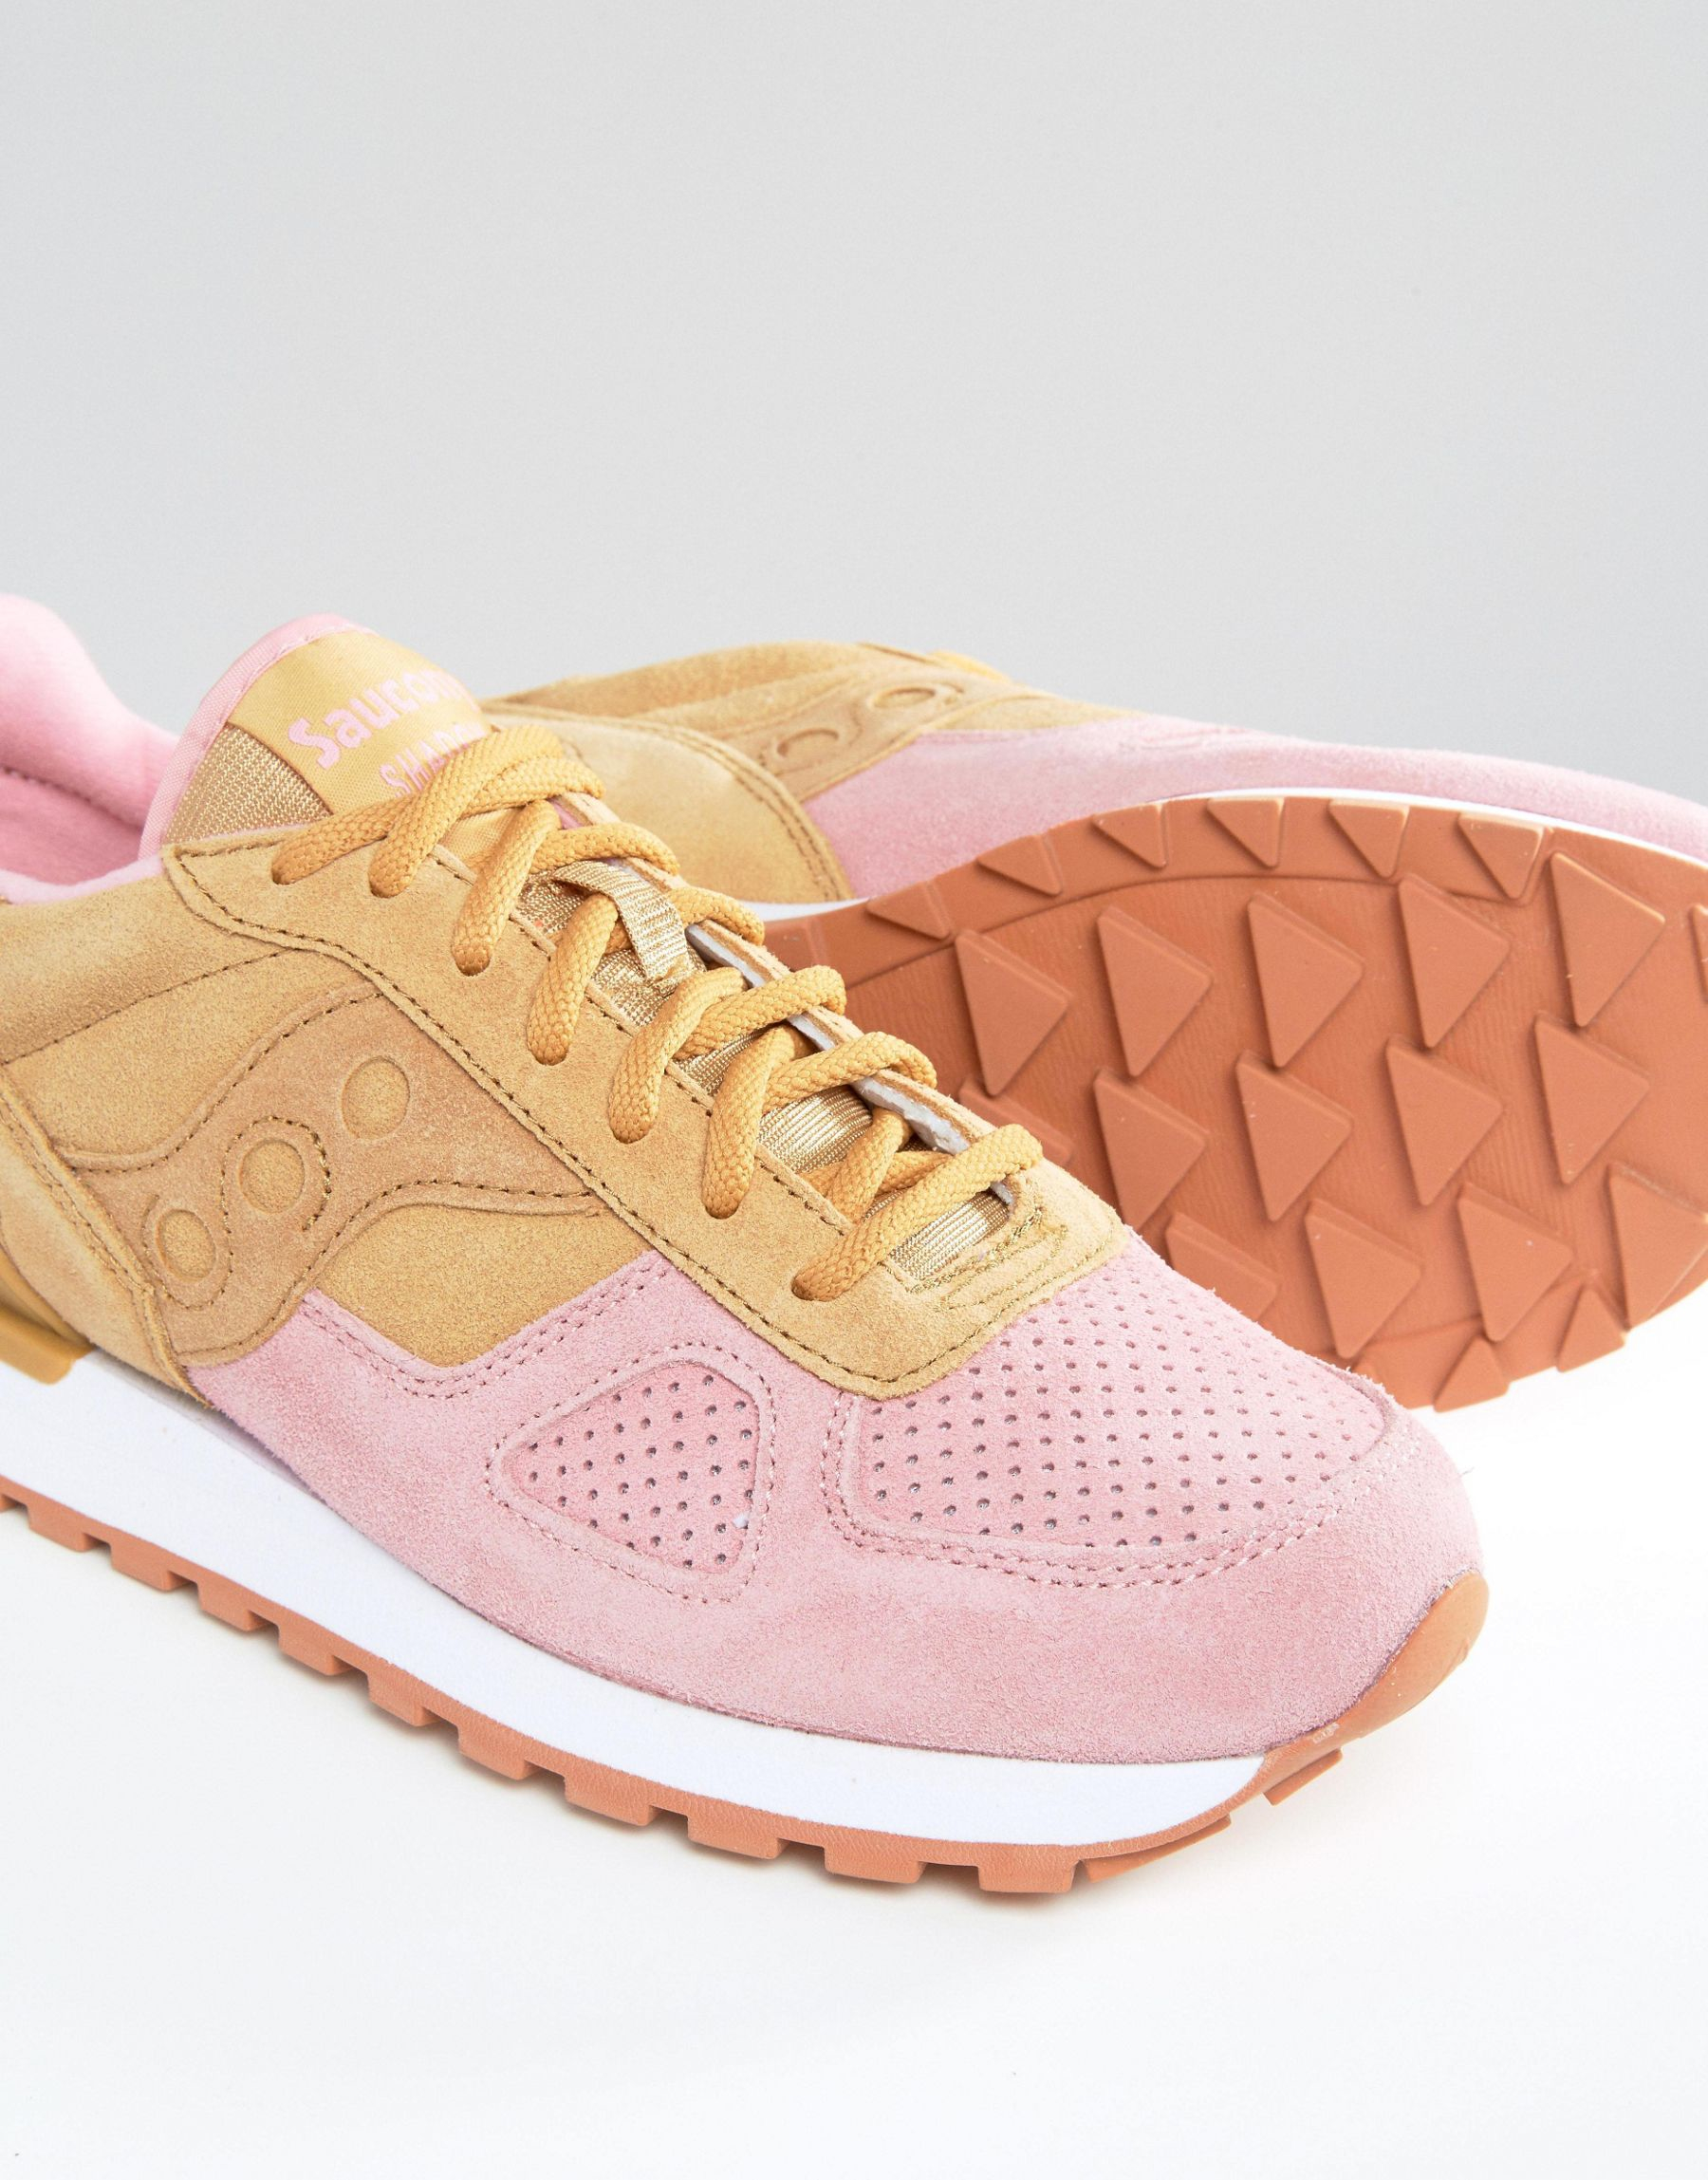 b8b19e50954f Lyst - Saucony Shadow Original Cannoli Trainers - Tan pink in Pink